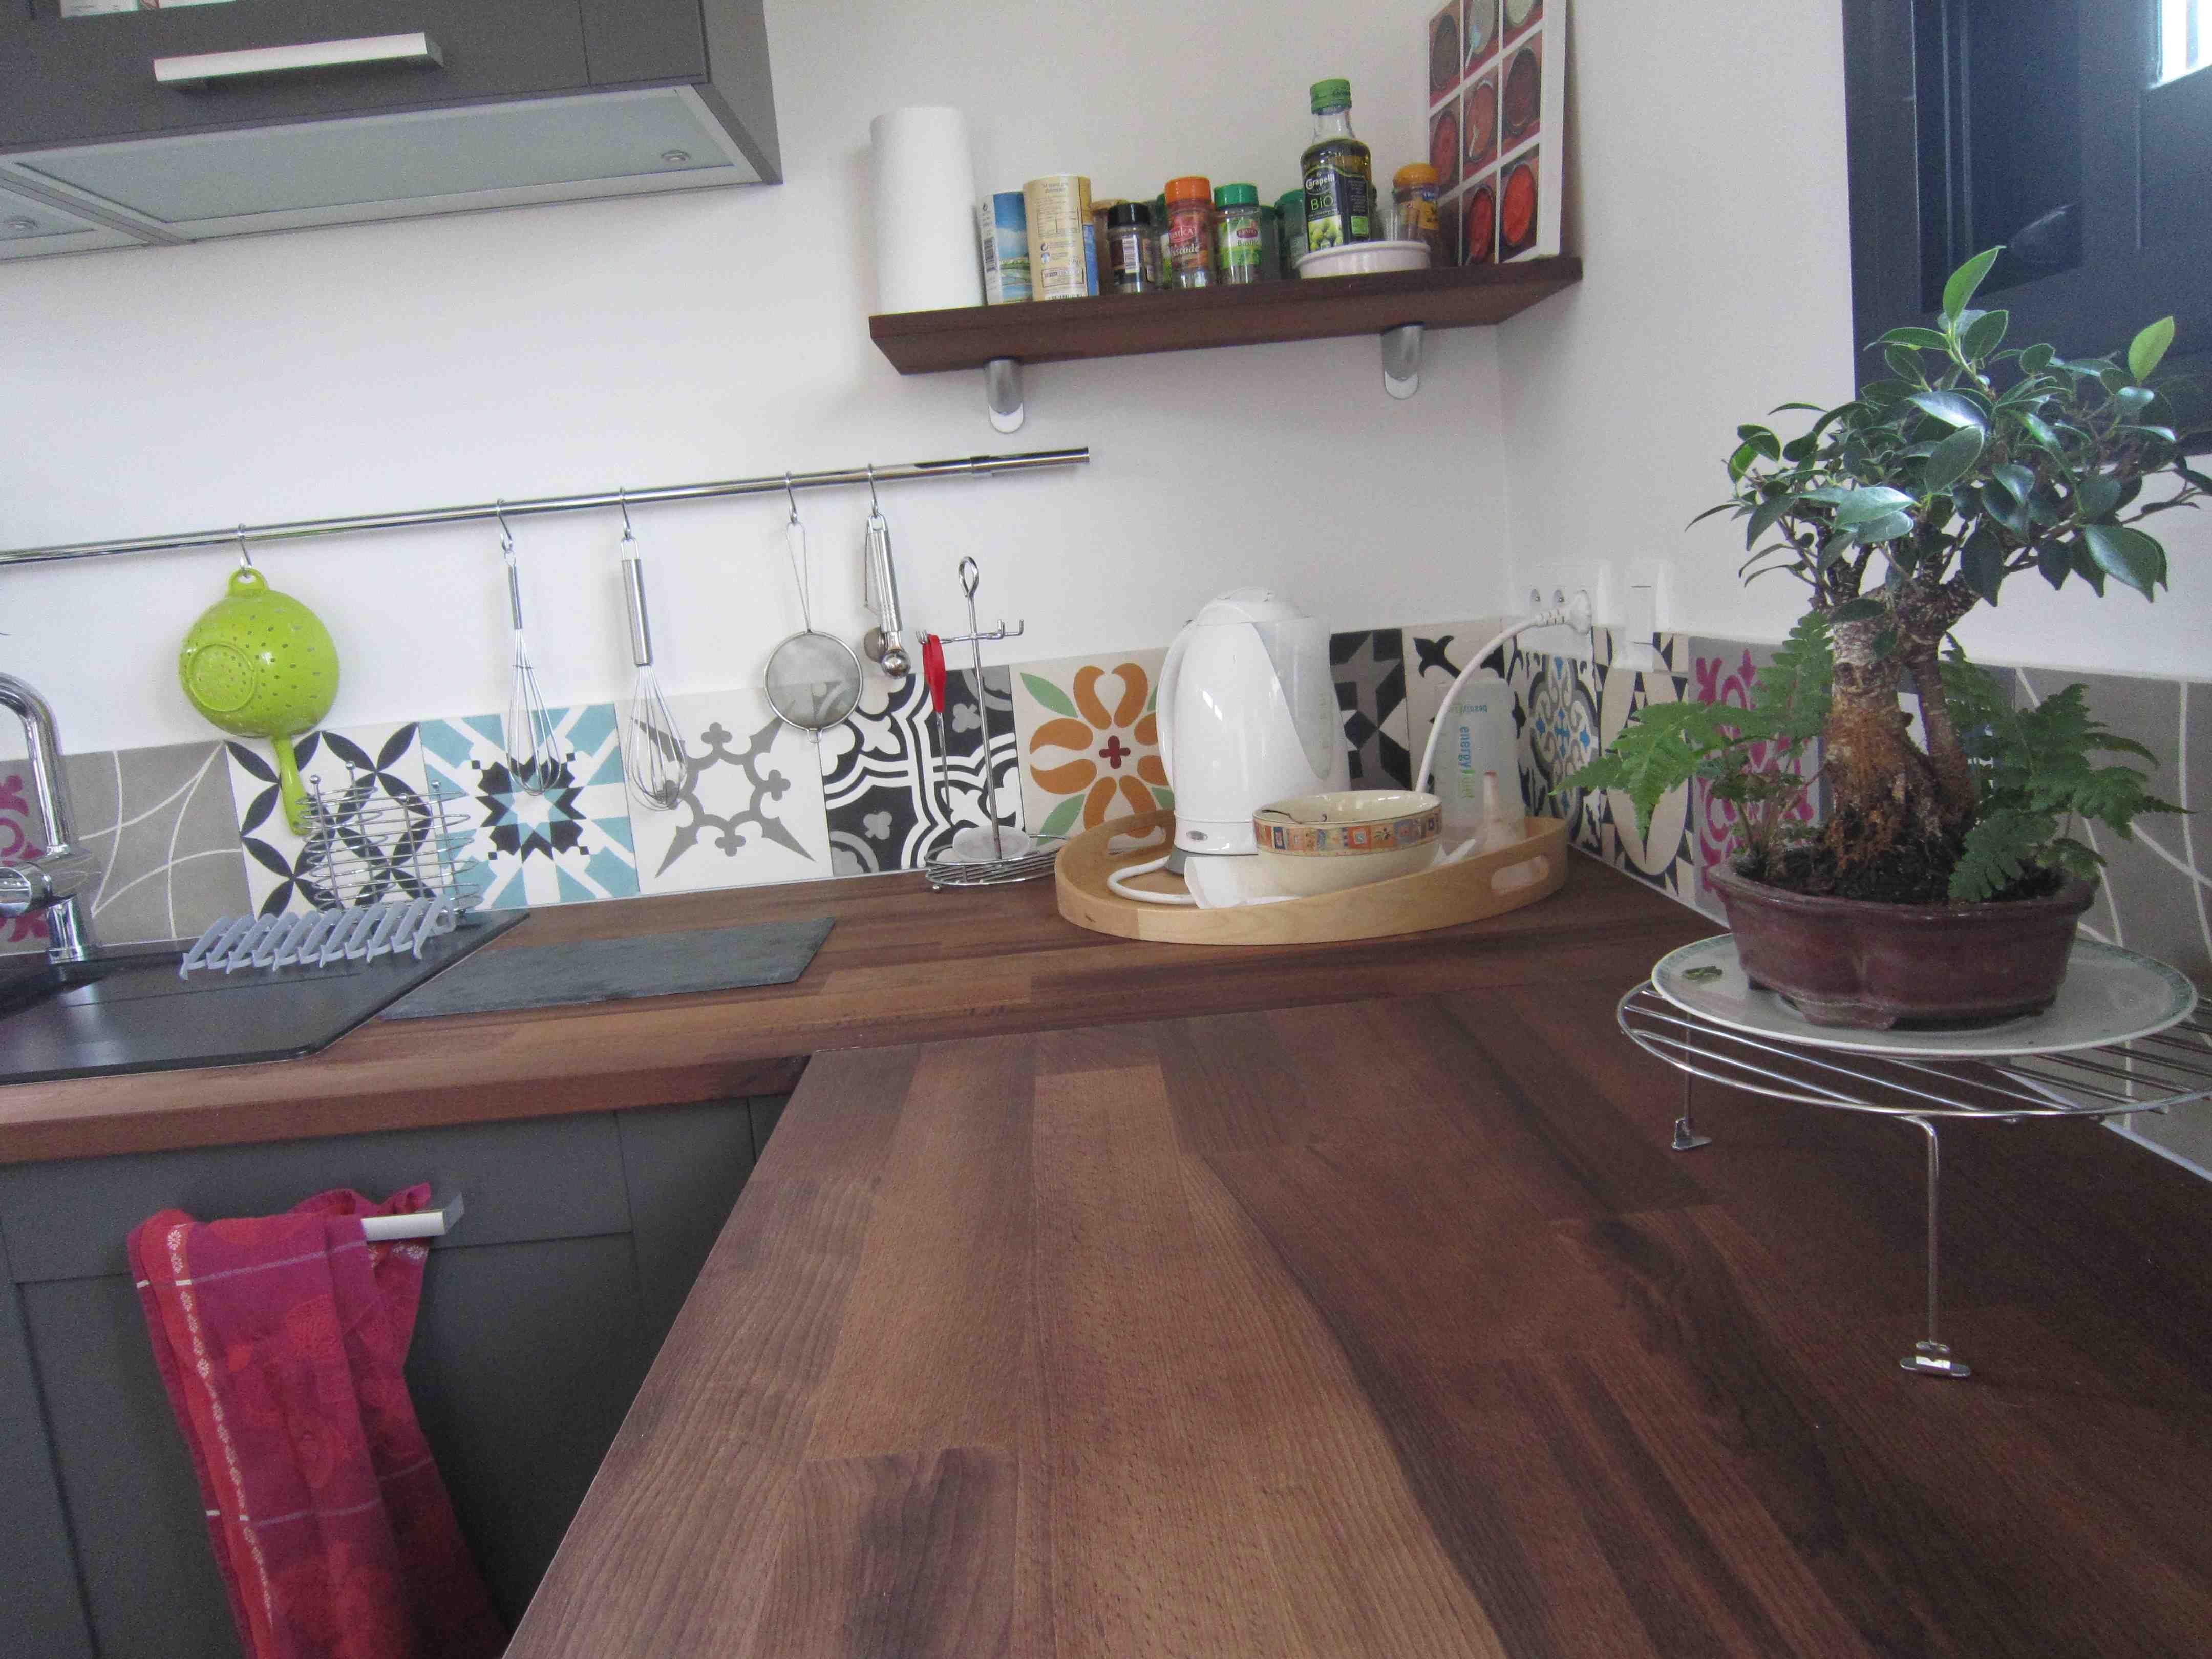 Epingle Par Melanie Mnr Sur Cuisine Idee Deco Cuisine Credence